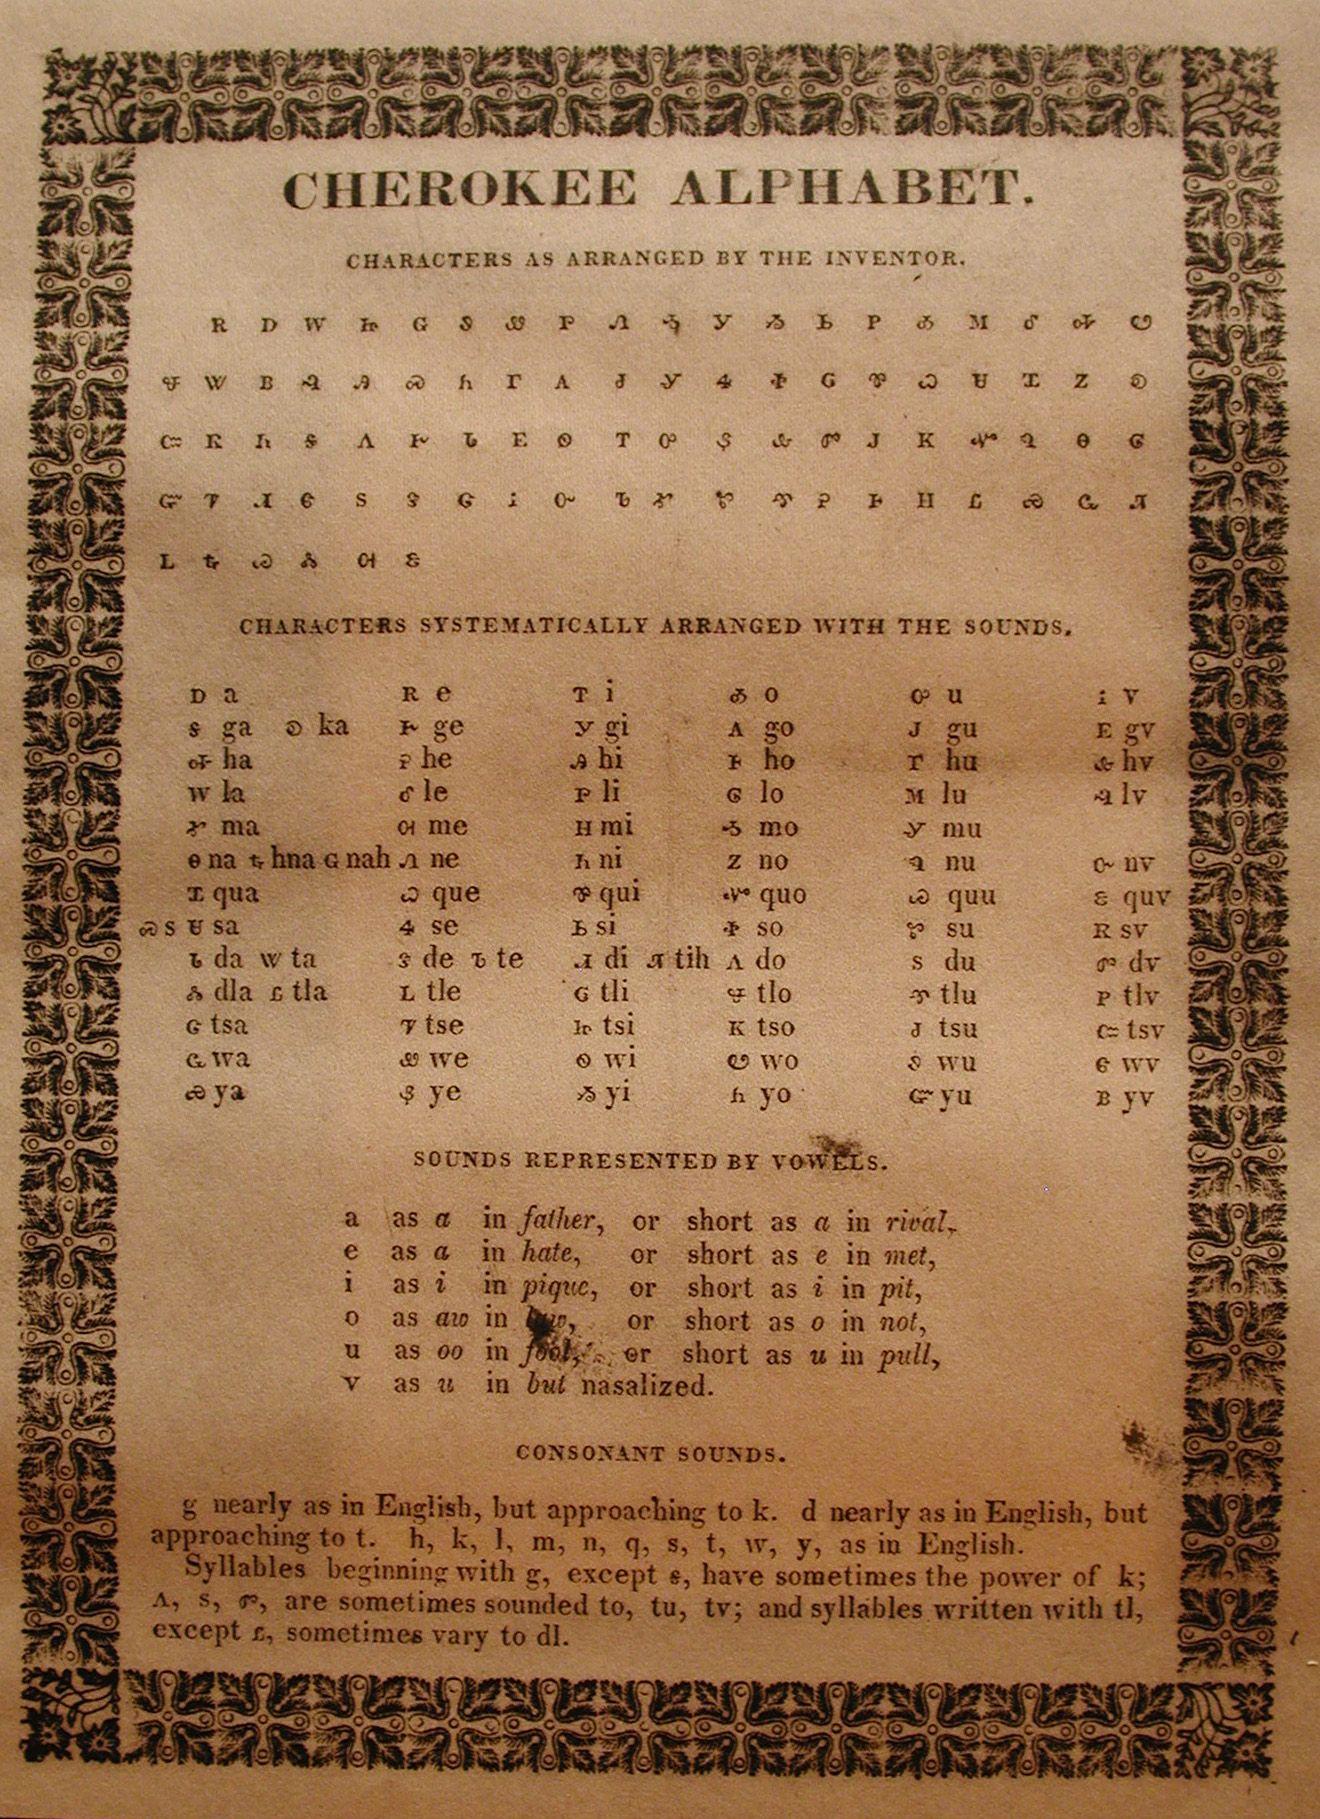 Pin By Emir Onuk On Languages Pinterest Indian Symbols Cherokee